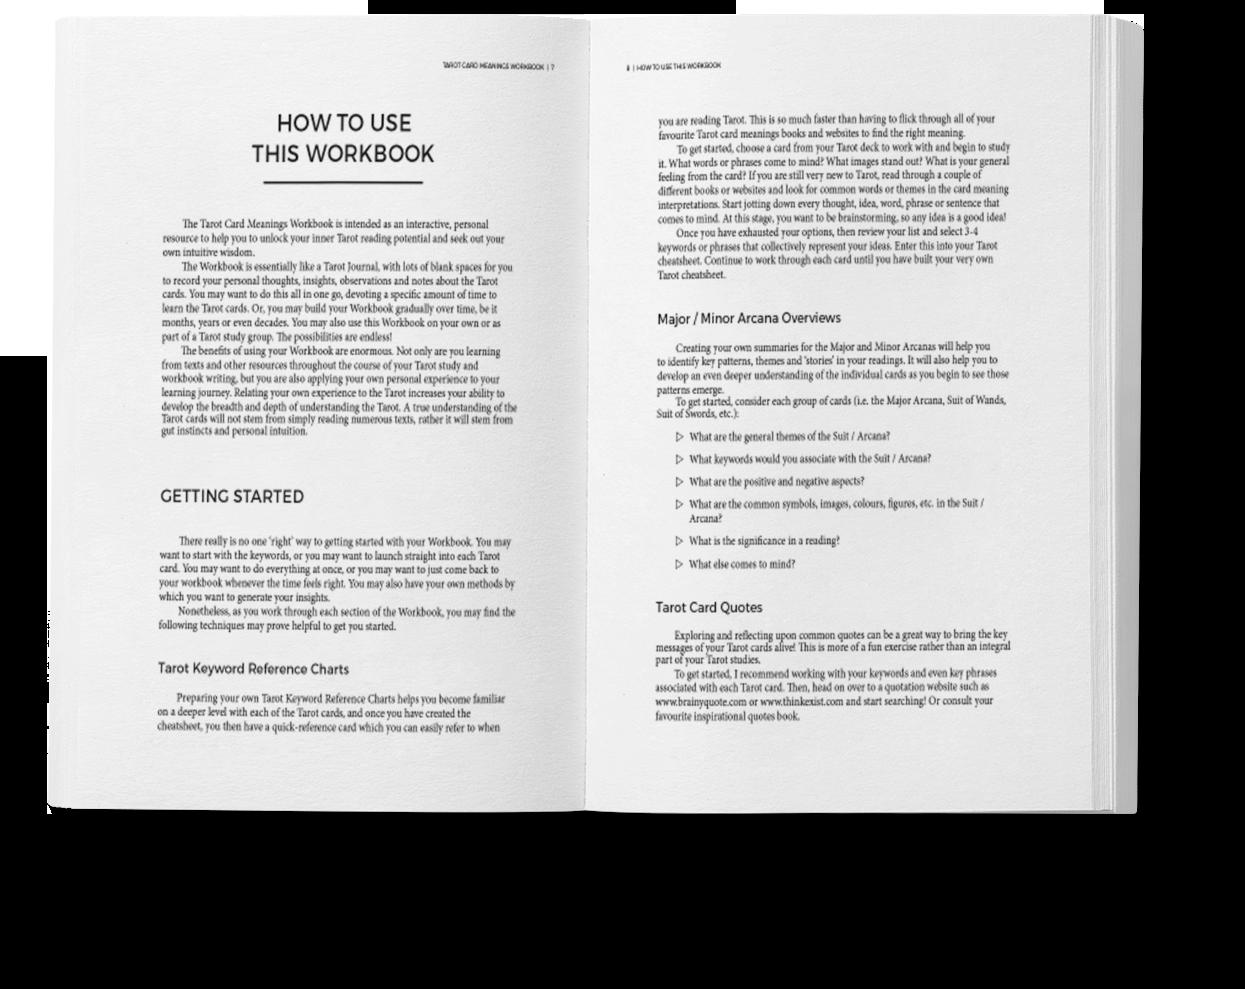 Workbooks workbook com : Tarot Card Meanings Workbook | Biddy Tarot